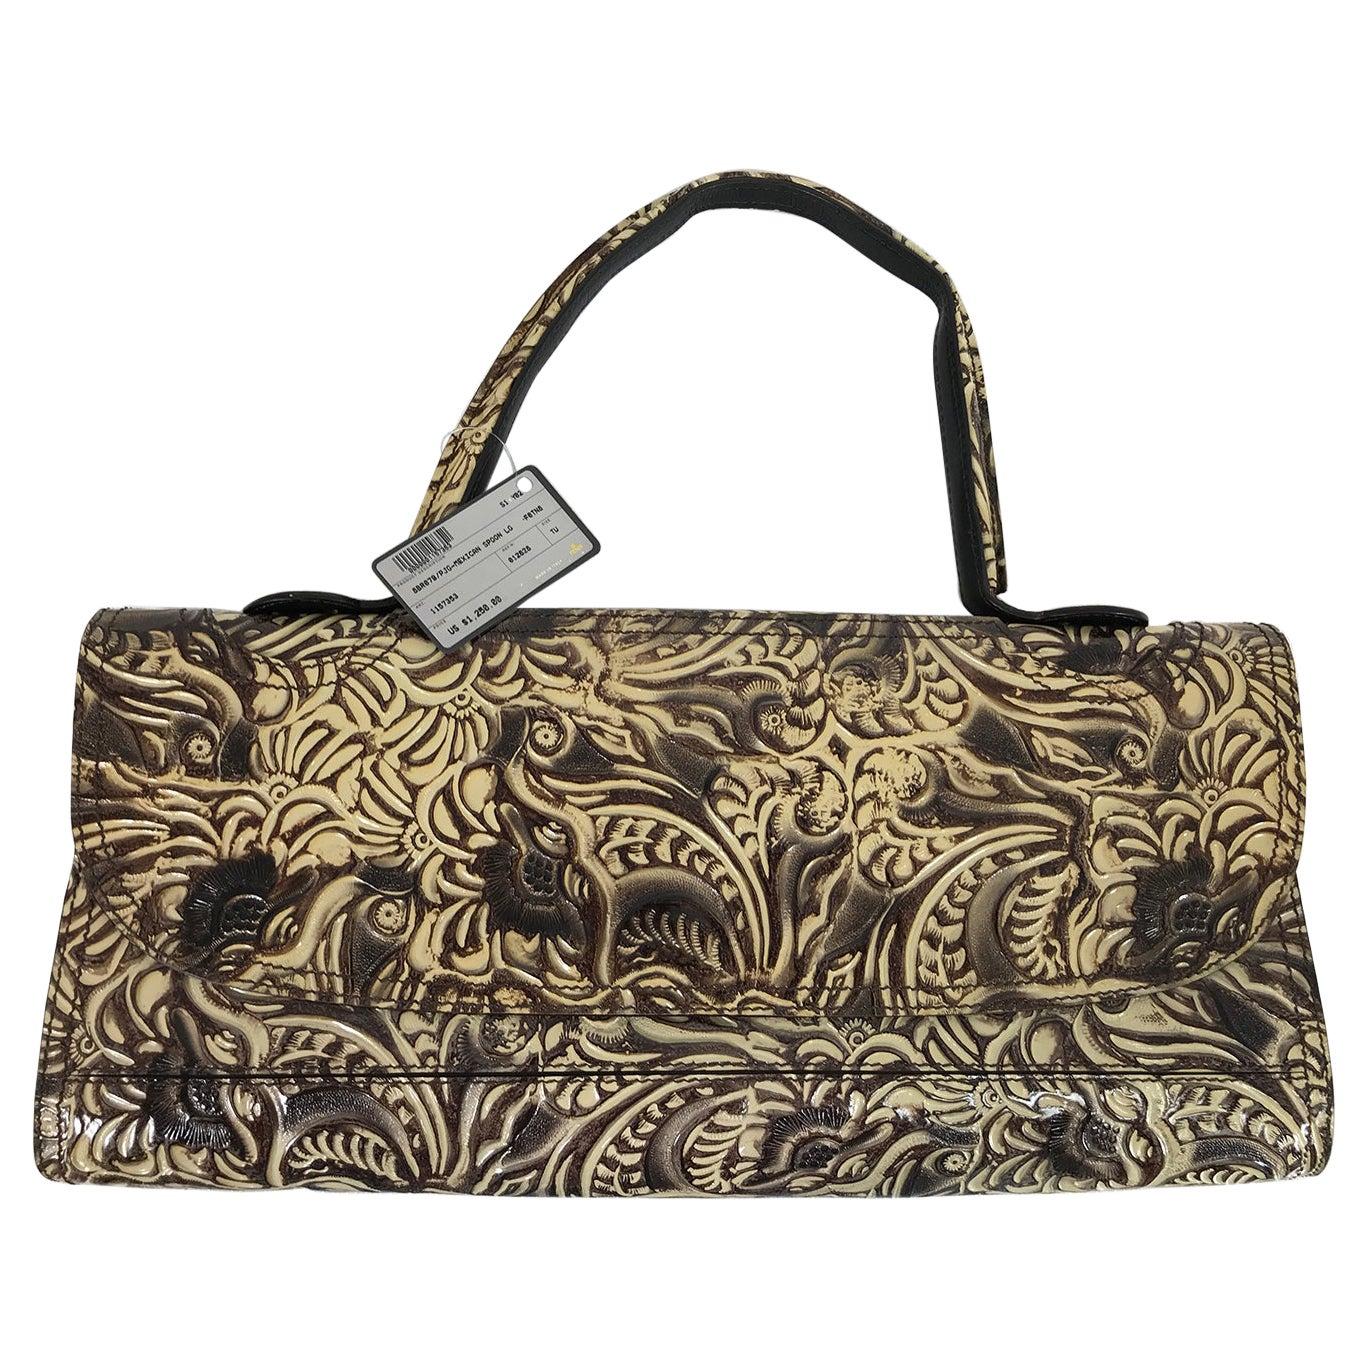 Fendi Flap Front Wide Brown & Cream Tooled leather Shoulder Bag Clutch